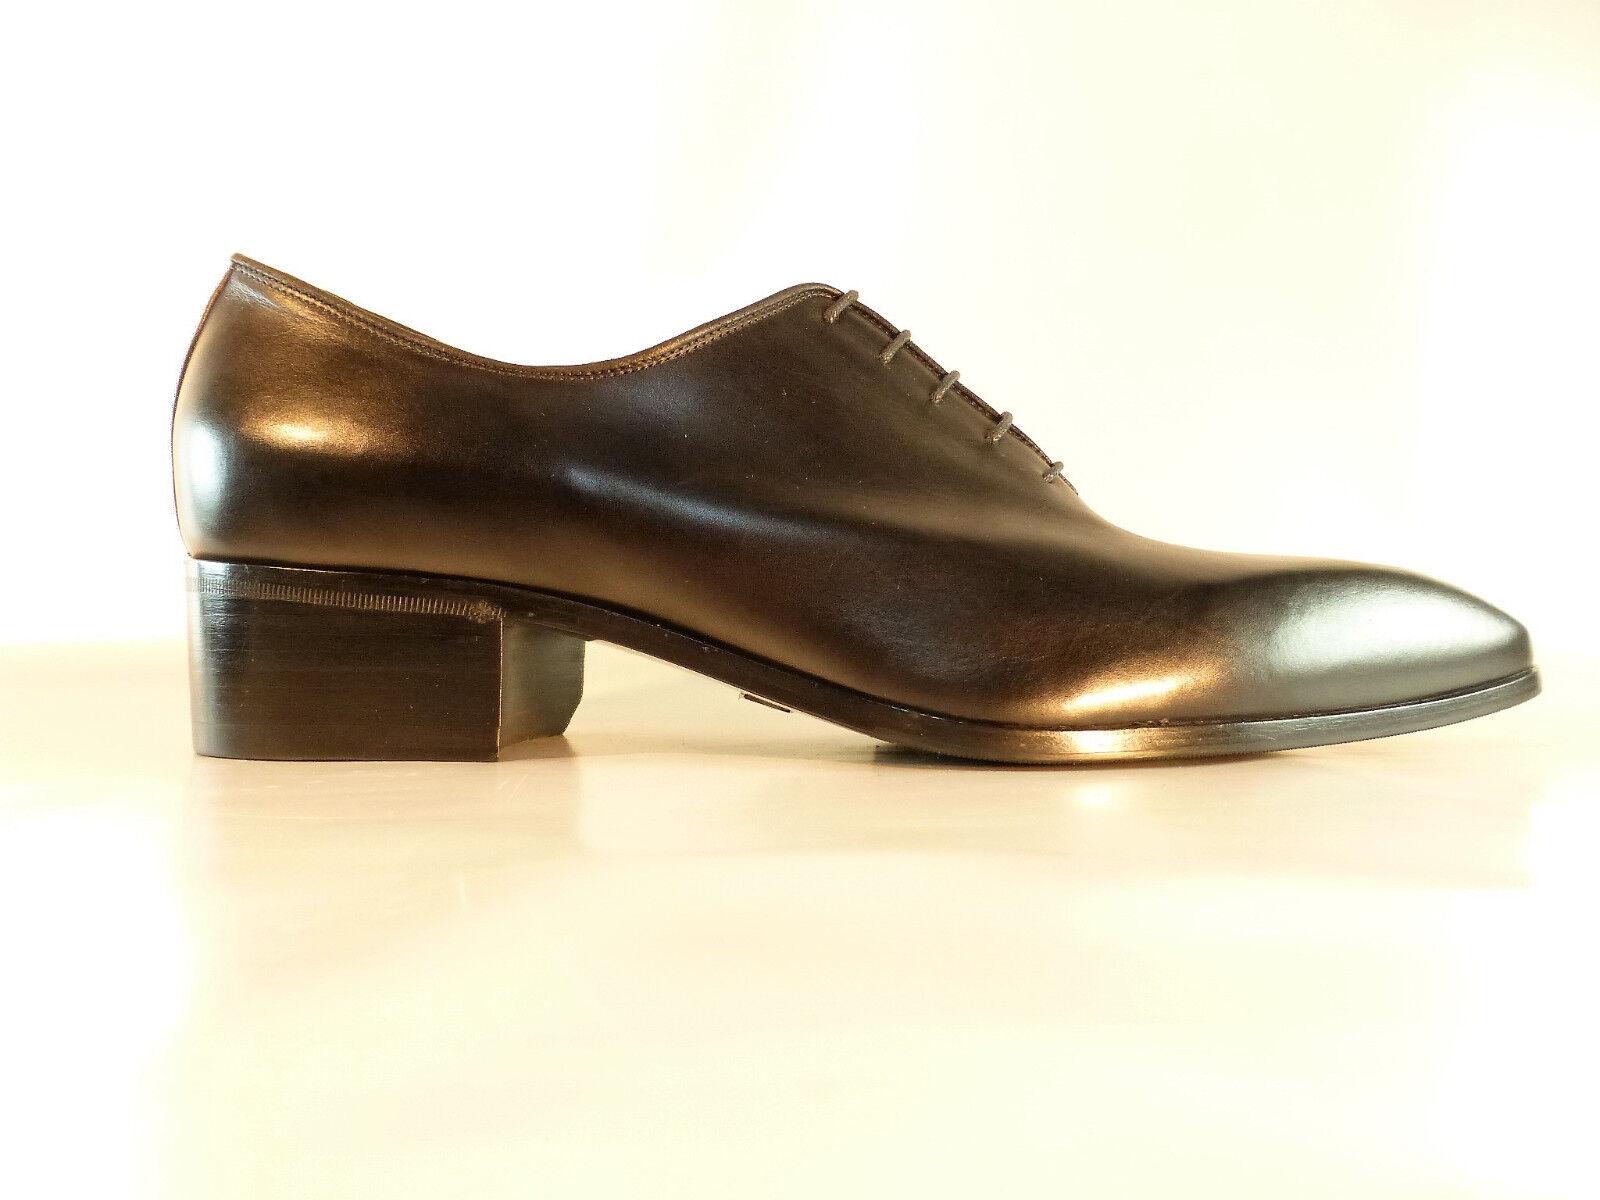 Nando Muzi   besondere Business Schuhe Schuhe Schuhe in schwarz - Klassiker  011 e2ae43